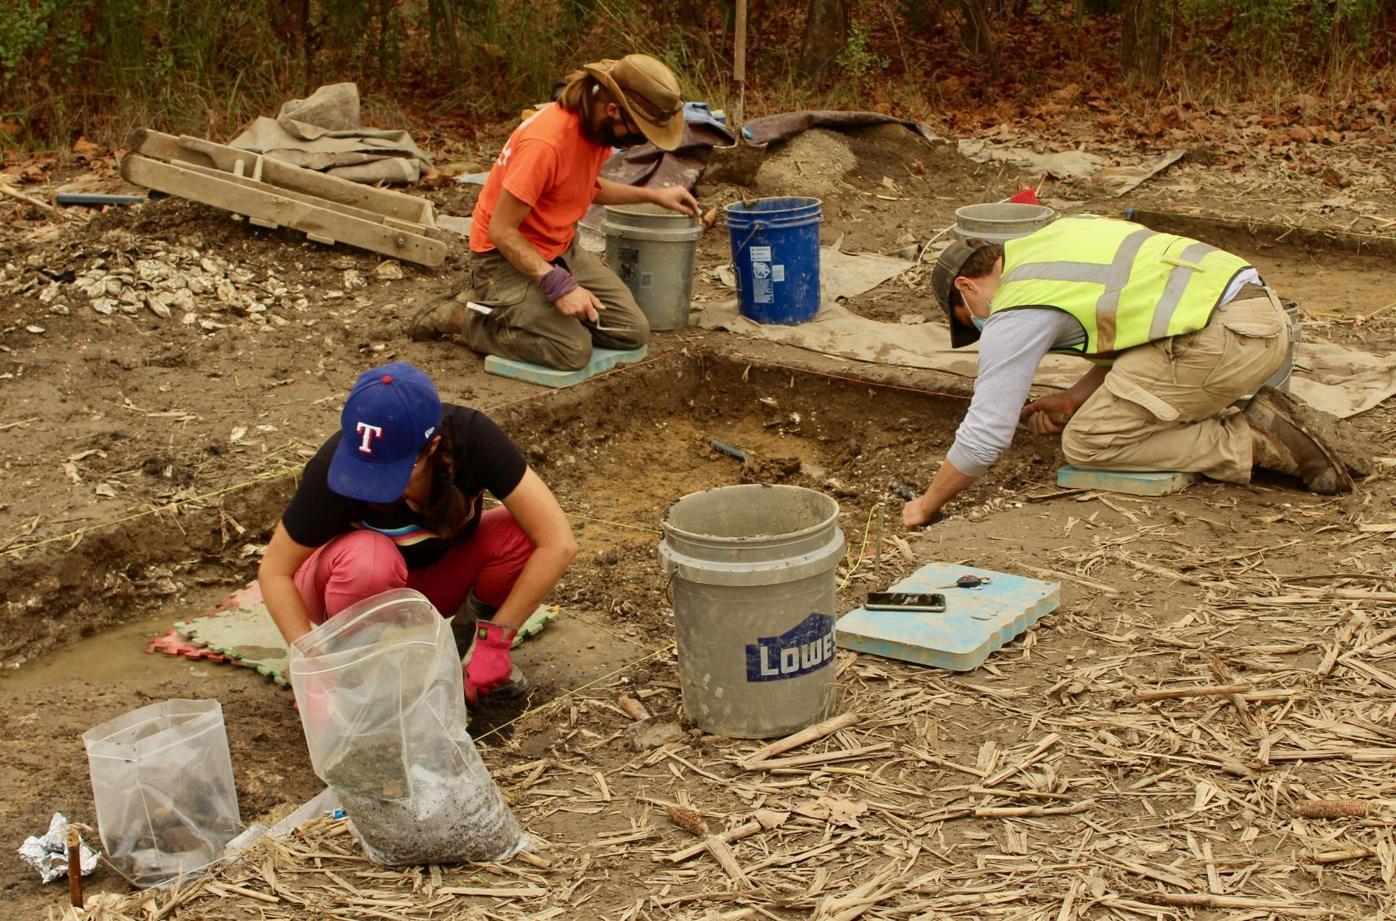 Digging up artifacts